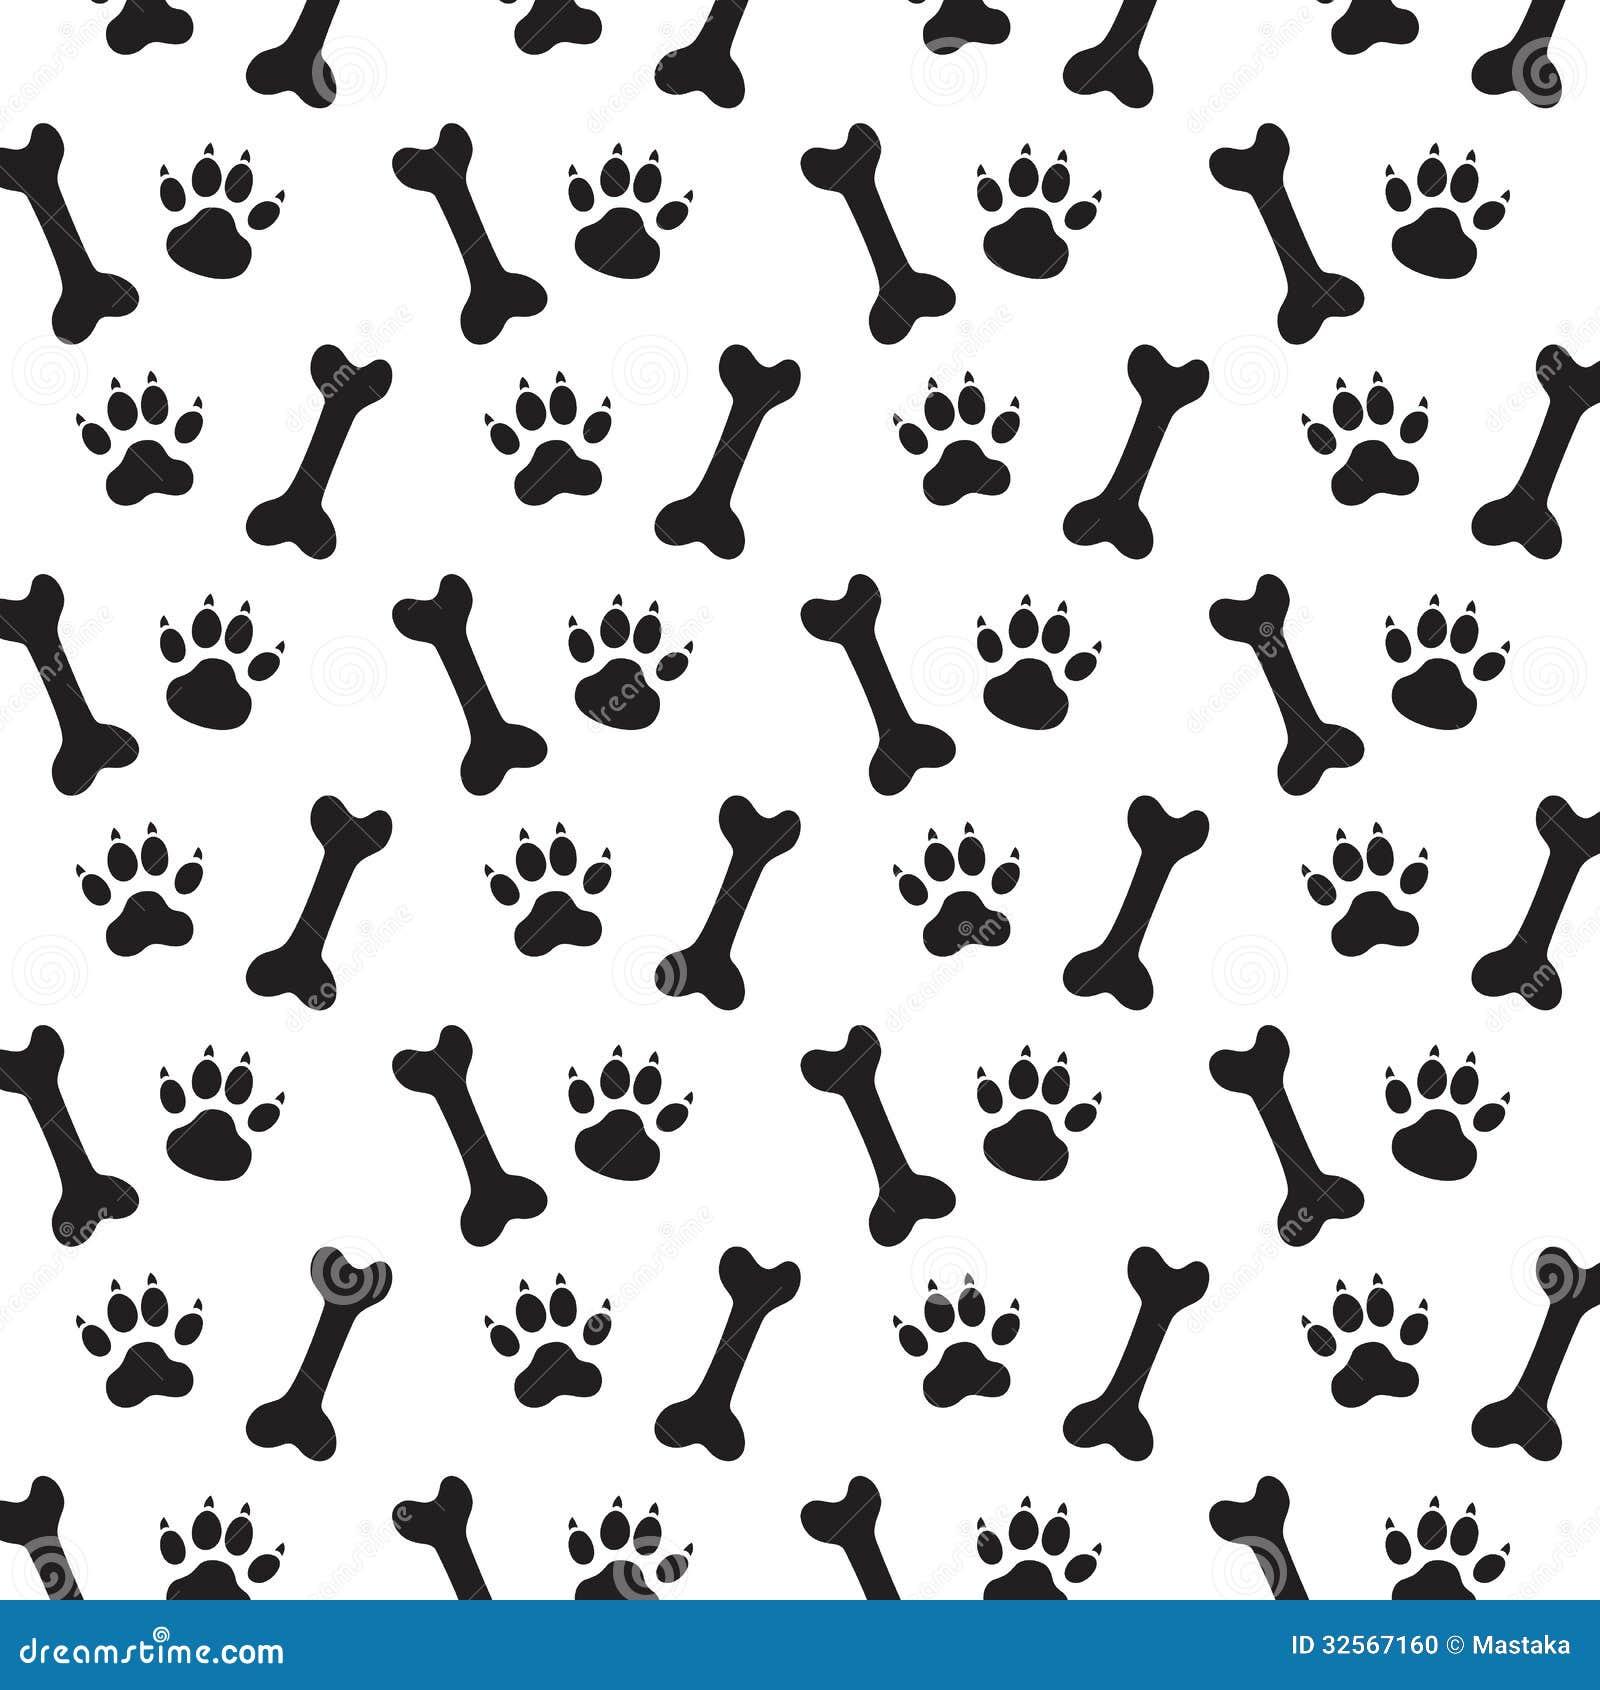 dog bone pattern - 736×736